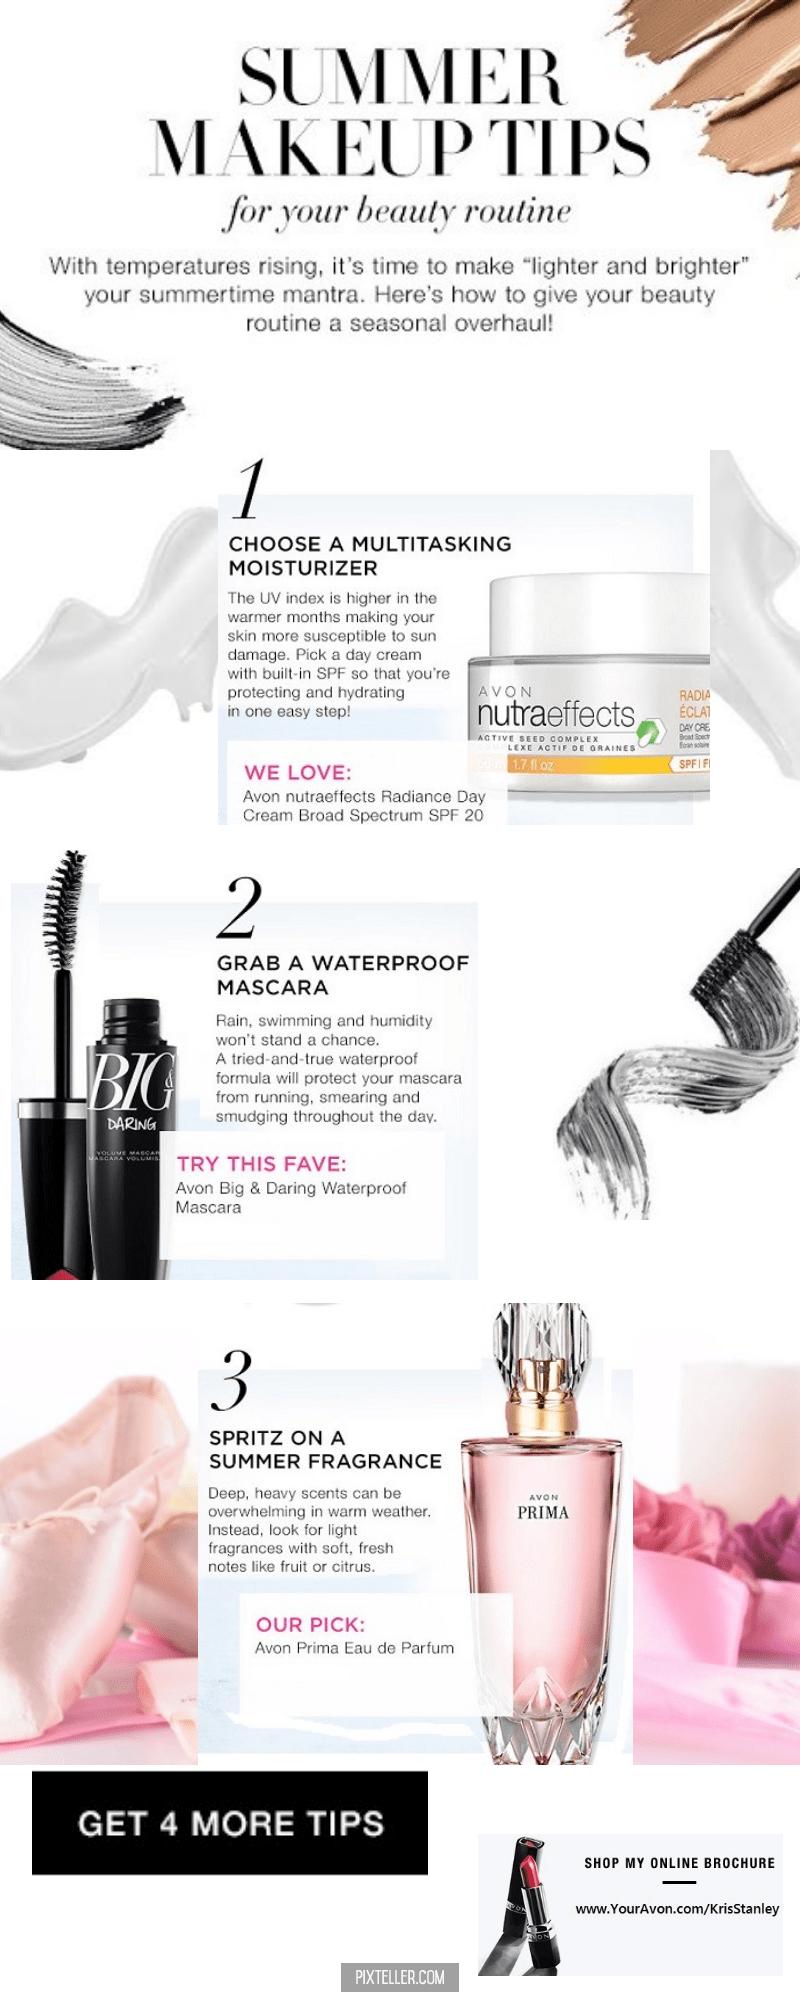 Product,                Advertising,                Brand,                Sense,                Cosmetics,                White,                 Free Image